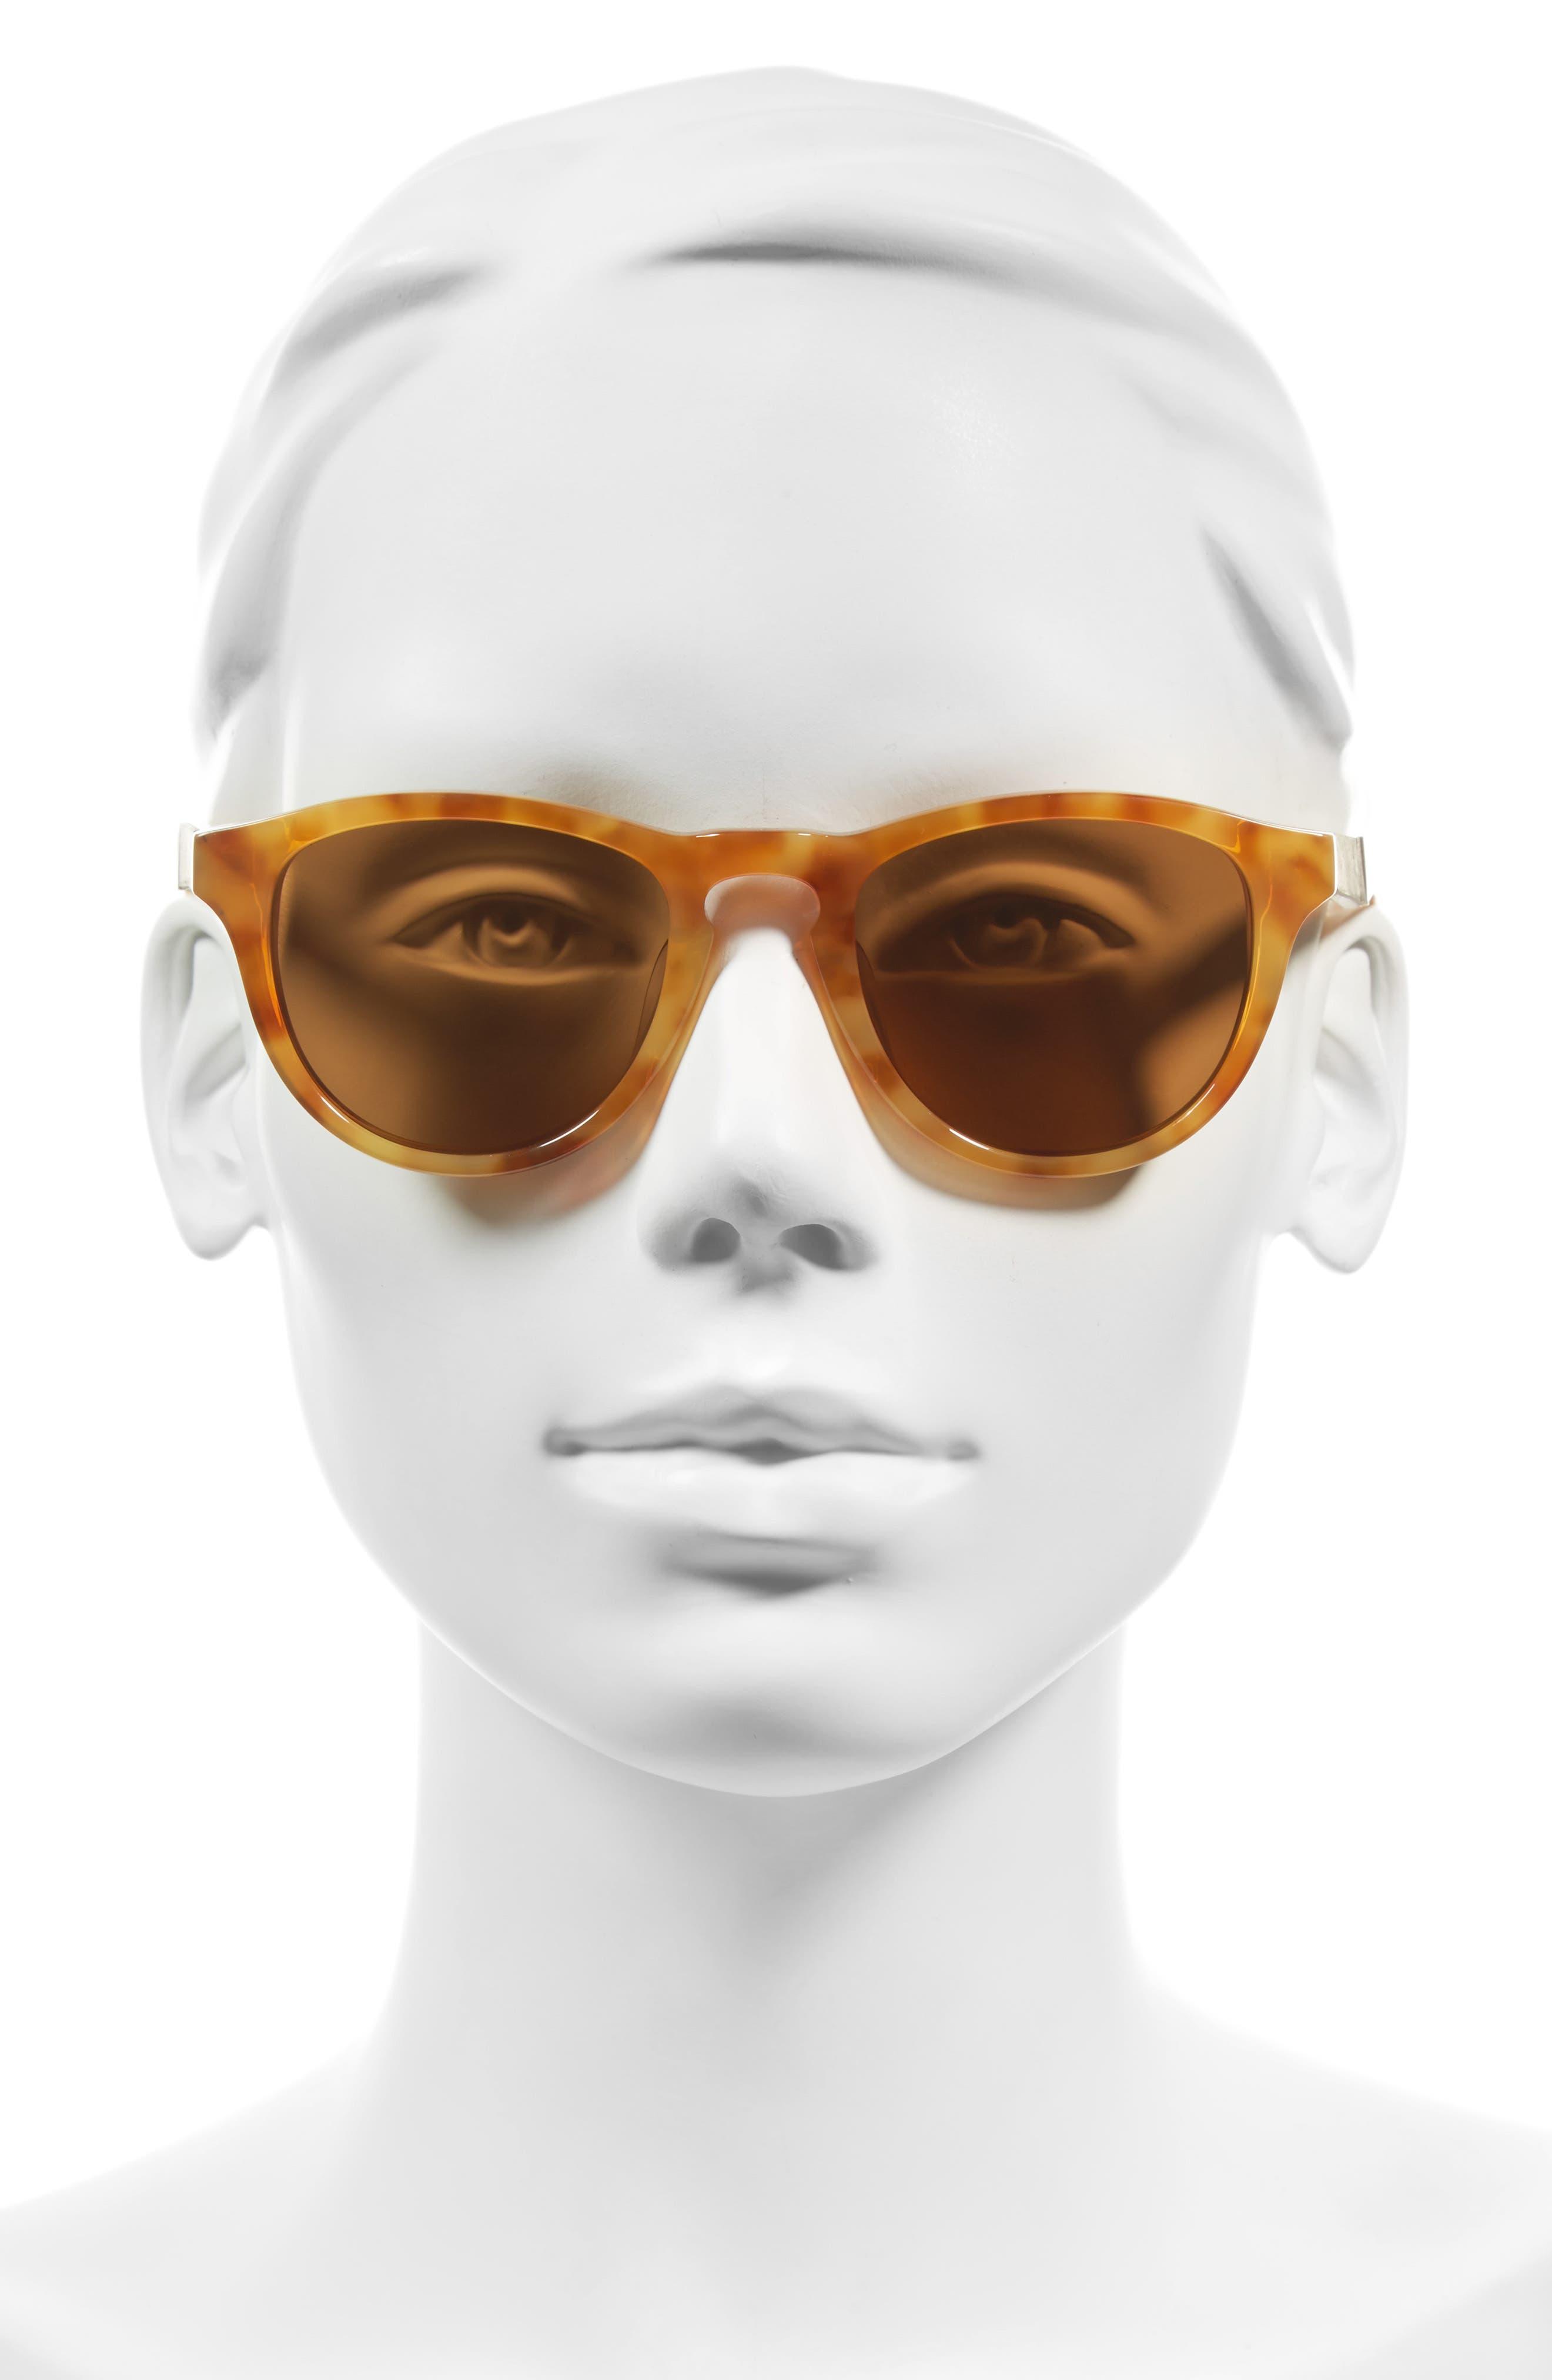 Ace 48mm Sunglasses,                             Alternate thumbnail 2, color,                             Amber/ Elm/ Brown Polar